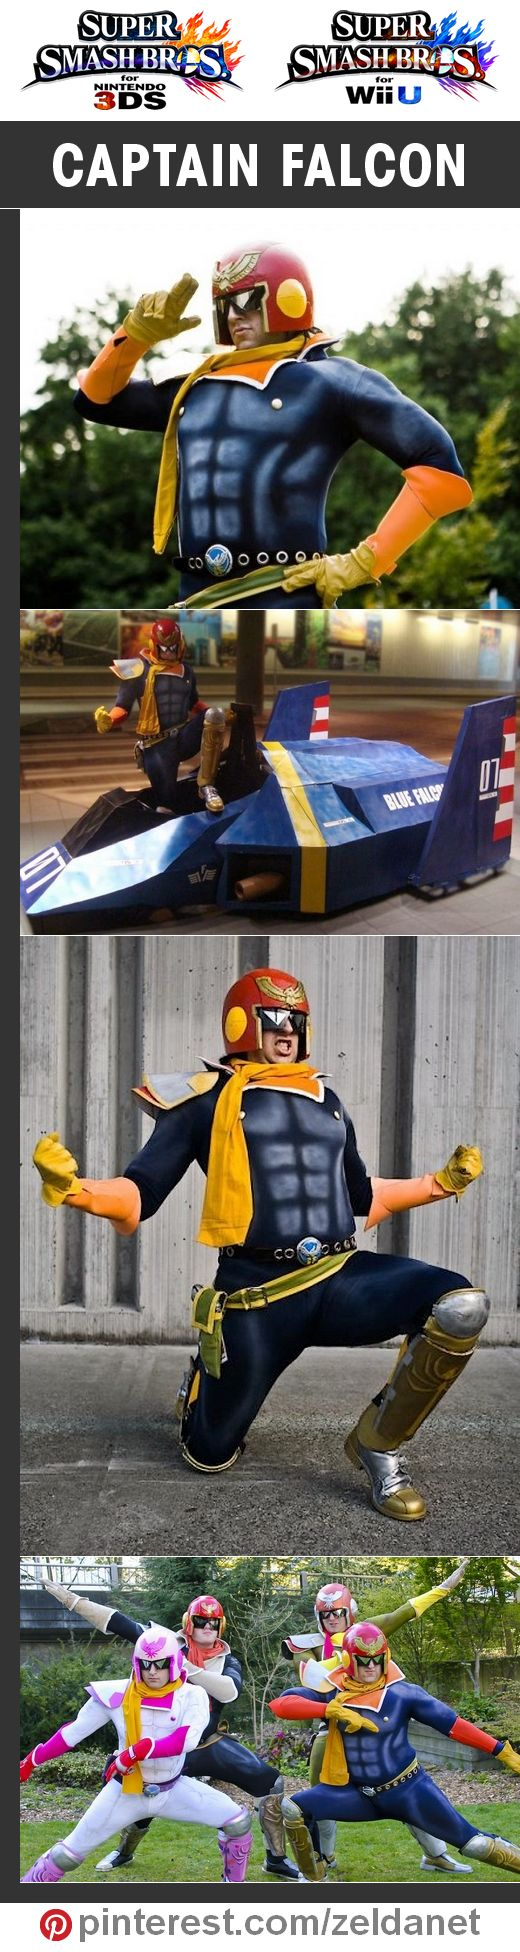 Captain Falcon by Ninjattorney in Super Smash Bros cosplay series   @nintendo #3DS #WiiU Credits in original post at http://www.pinterest.com/zeldanet/super-smash-bros-cosplay-series/